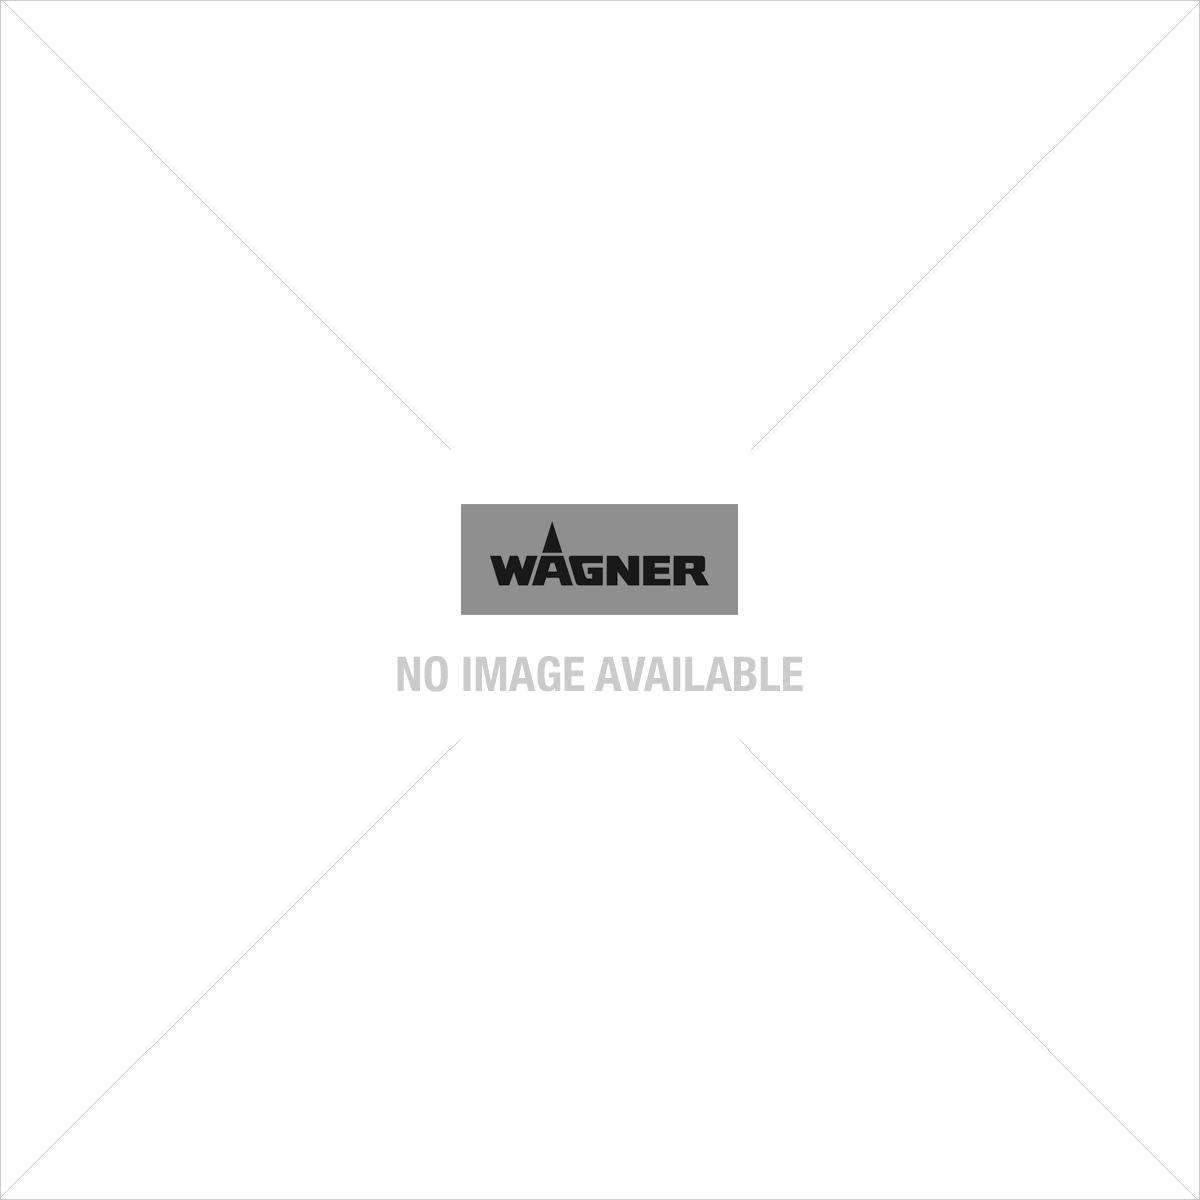 Wagner W180 P Airless - Traitement du Bois